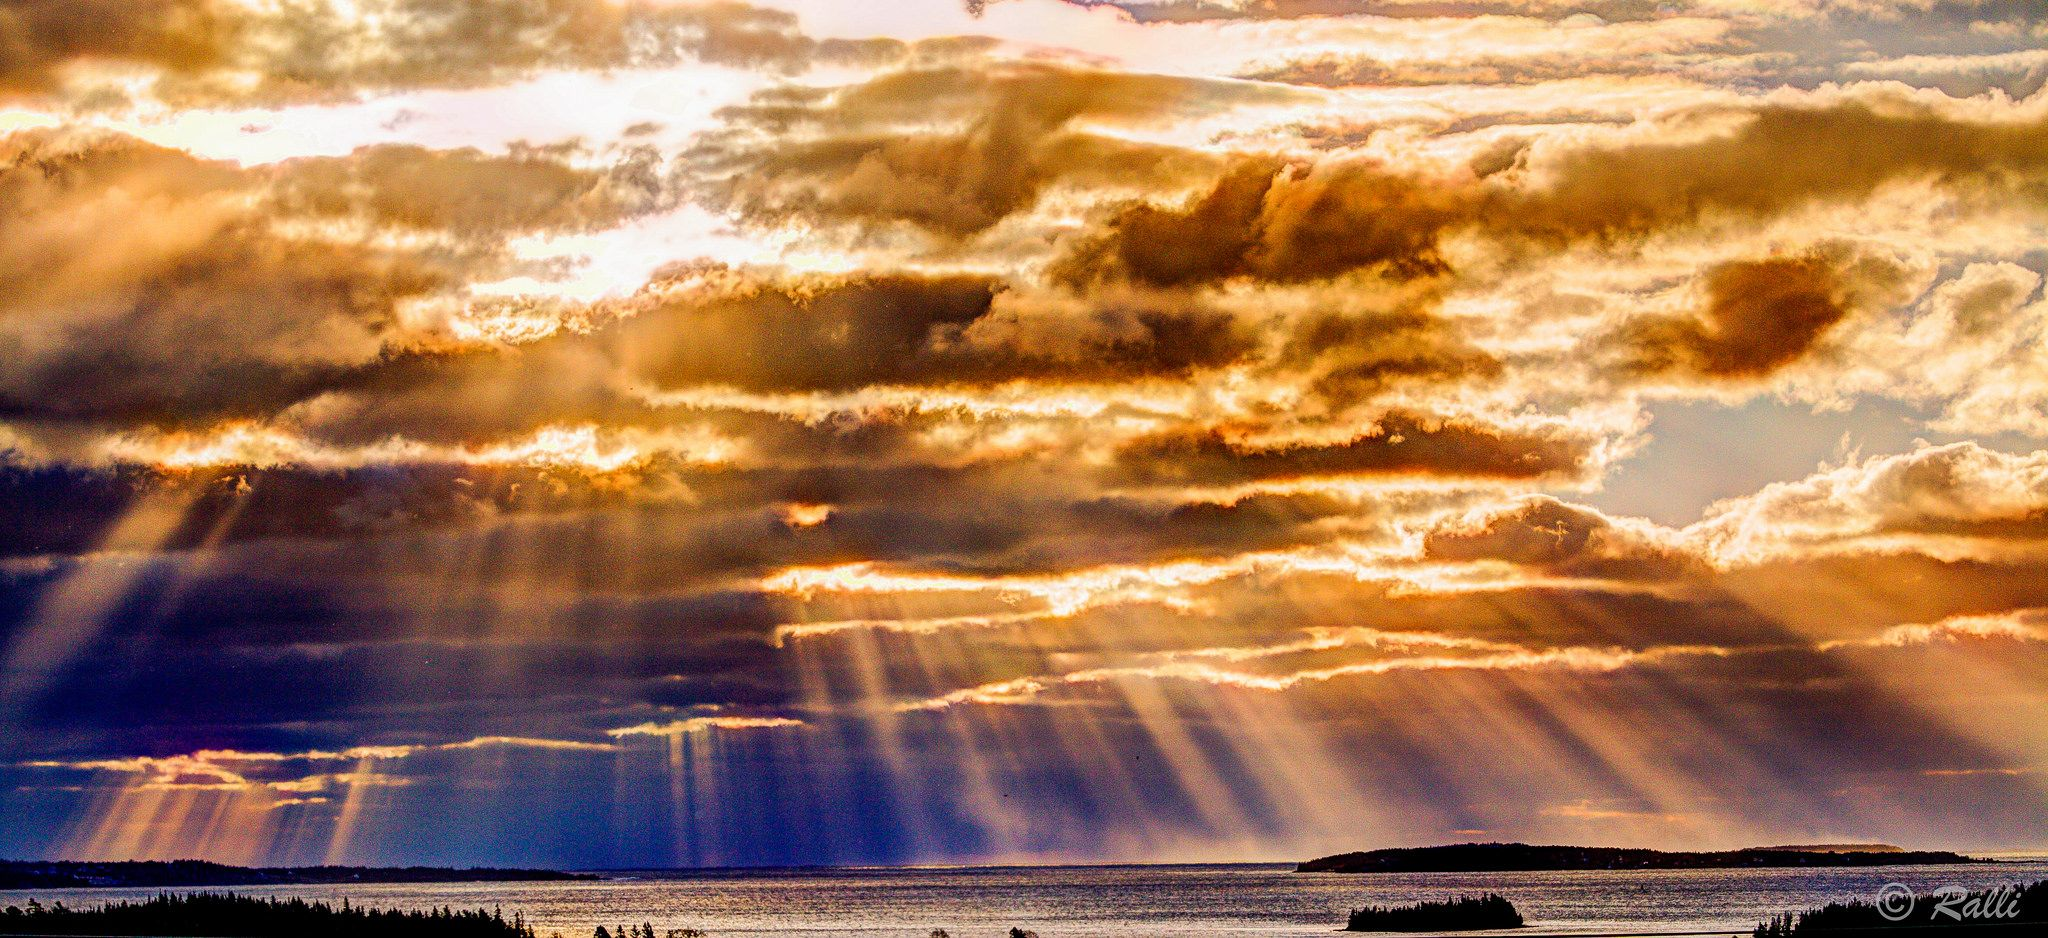 goooood morning Nova Scotia Nova scotia, Scotia, Sky art